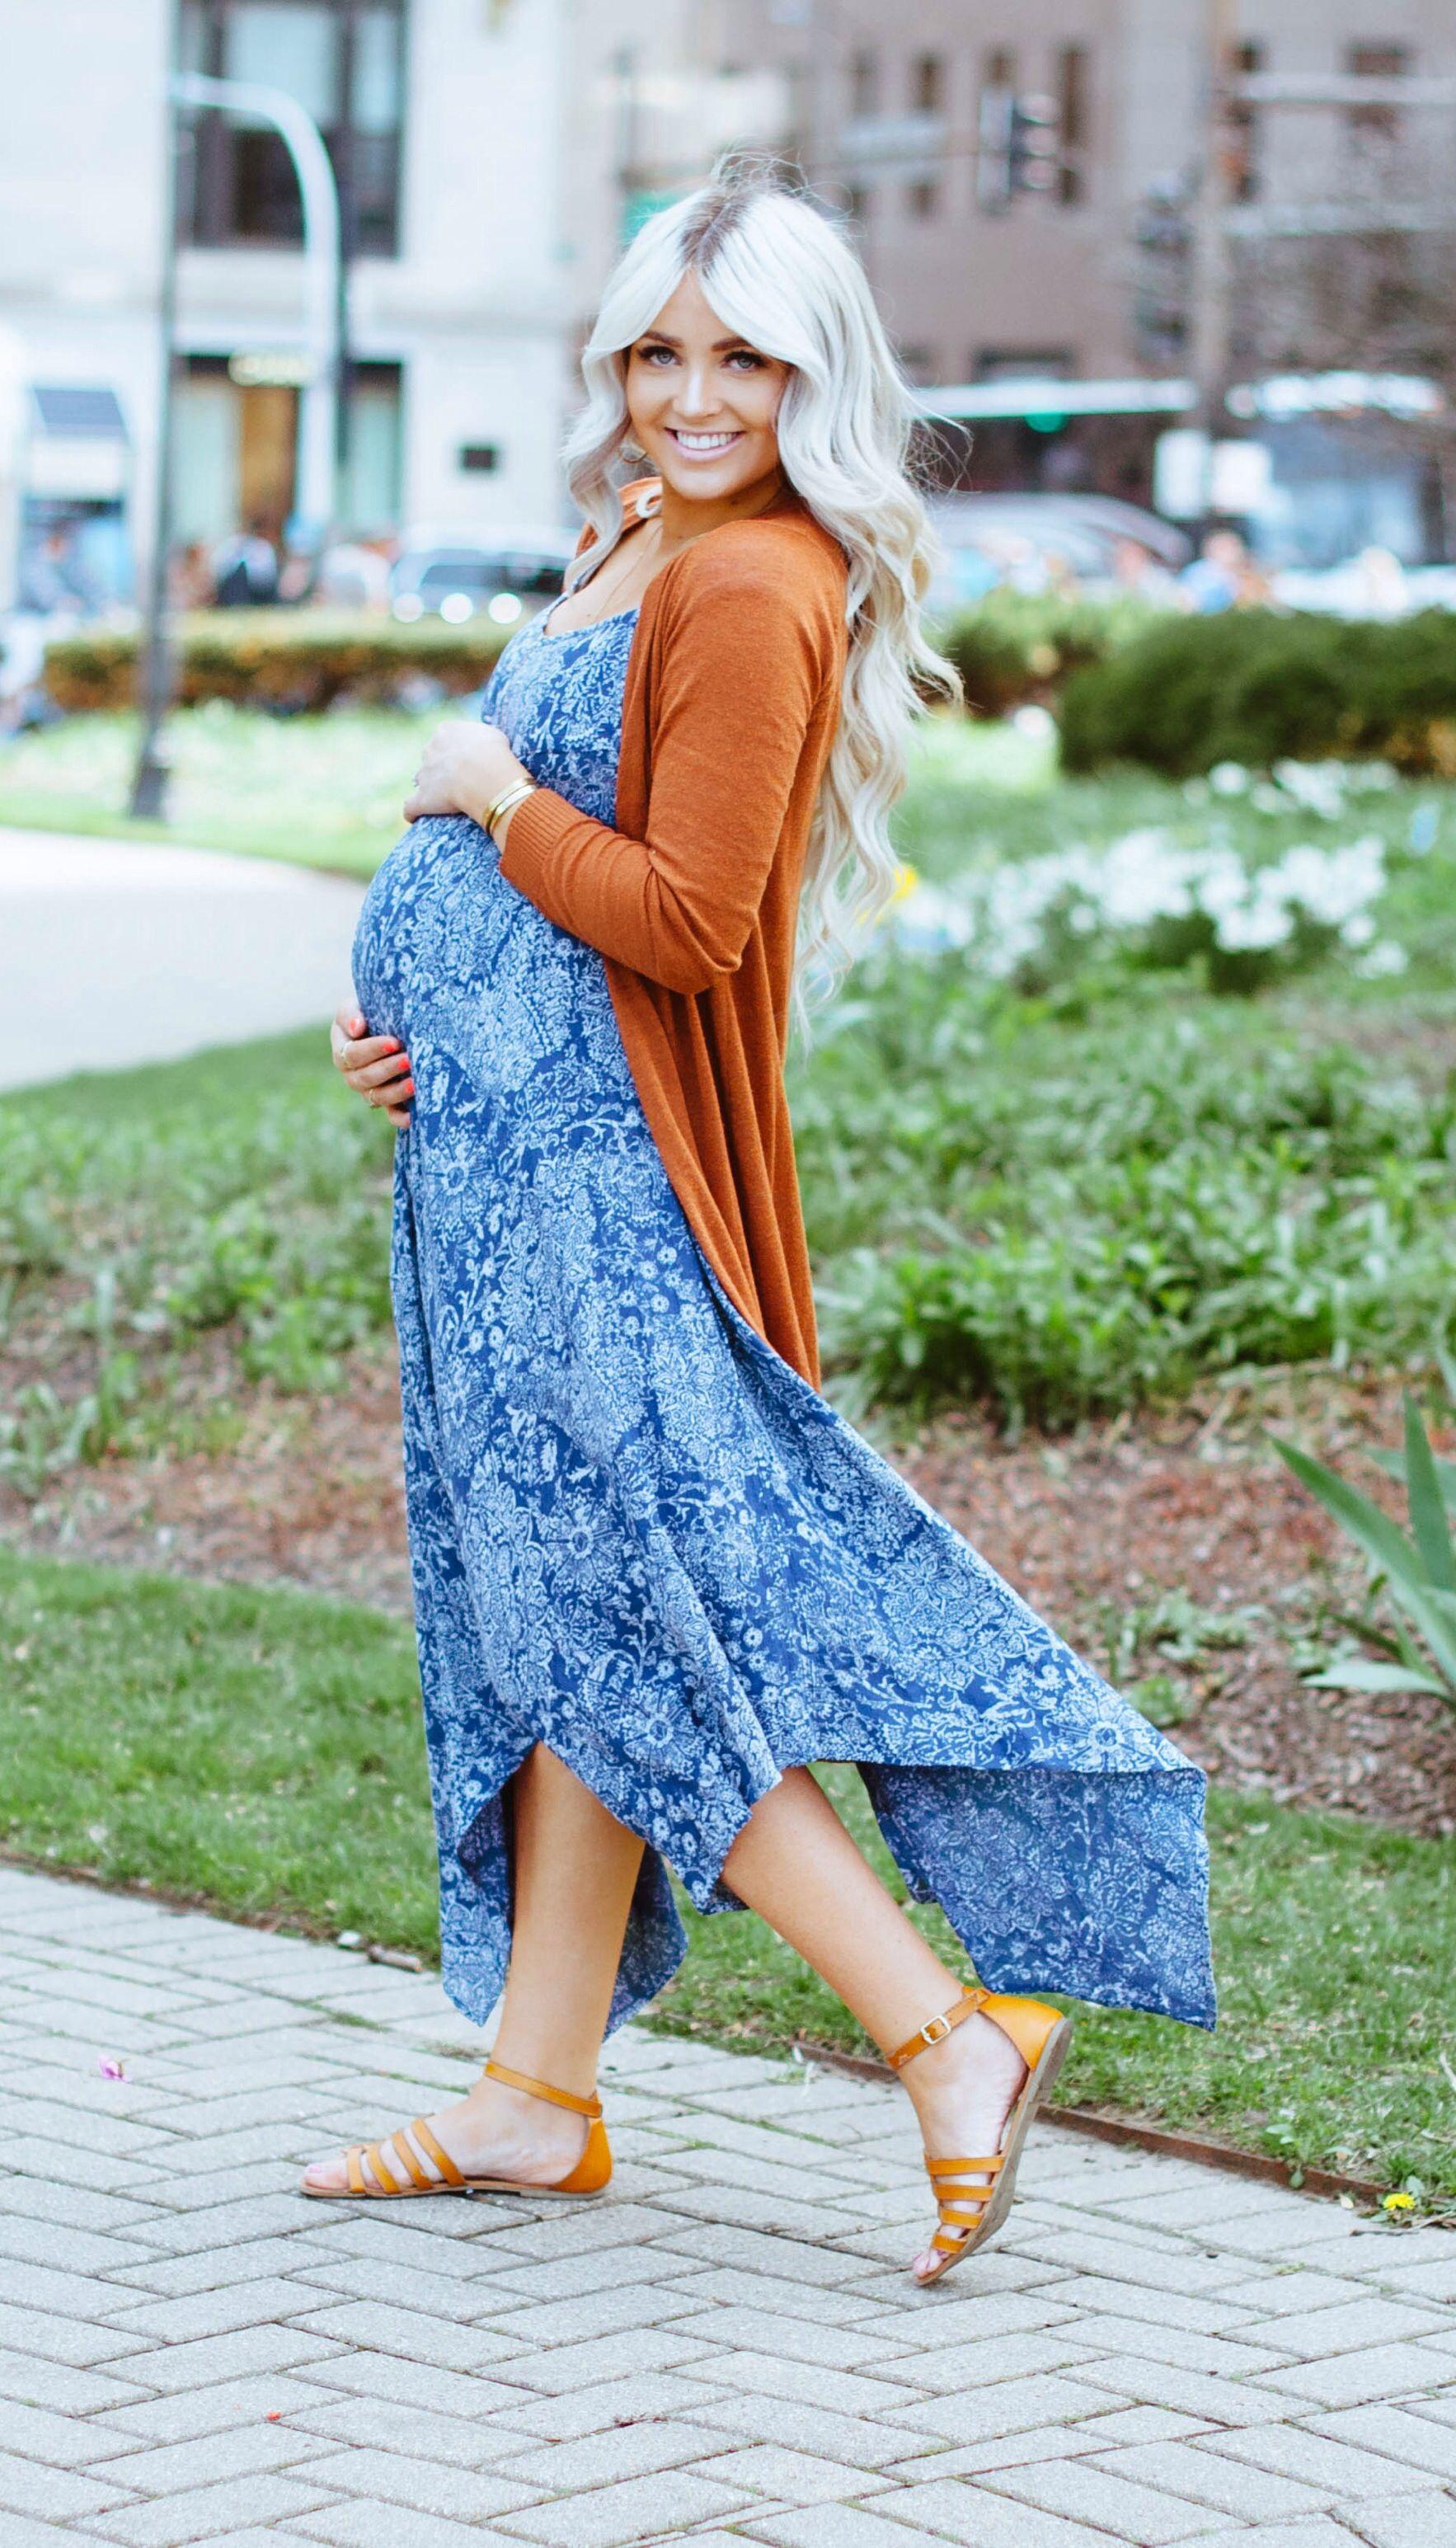 Maternity dresses to wear to a wedding  Maternity style  Maternity Fashion  Pinterest  Maternity styles